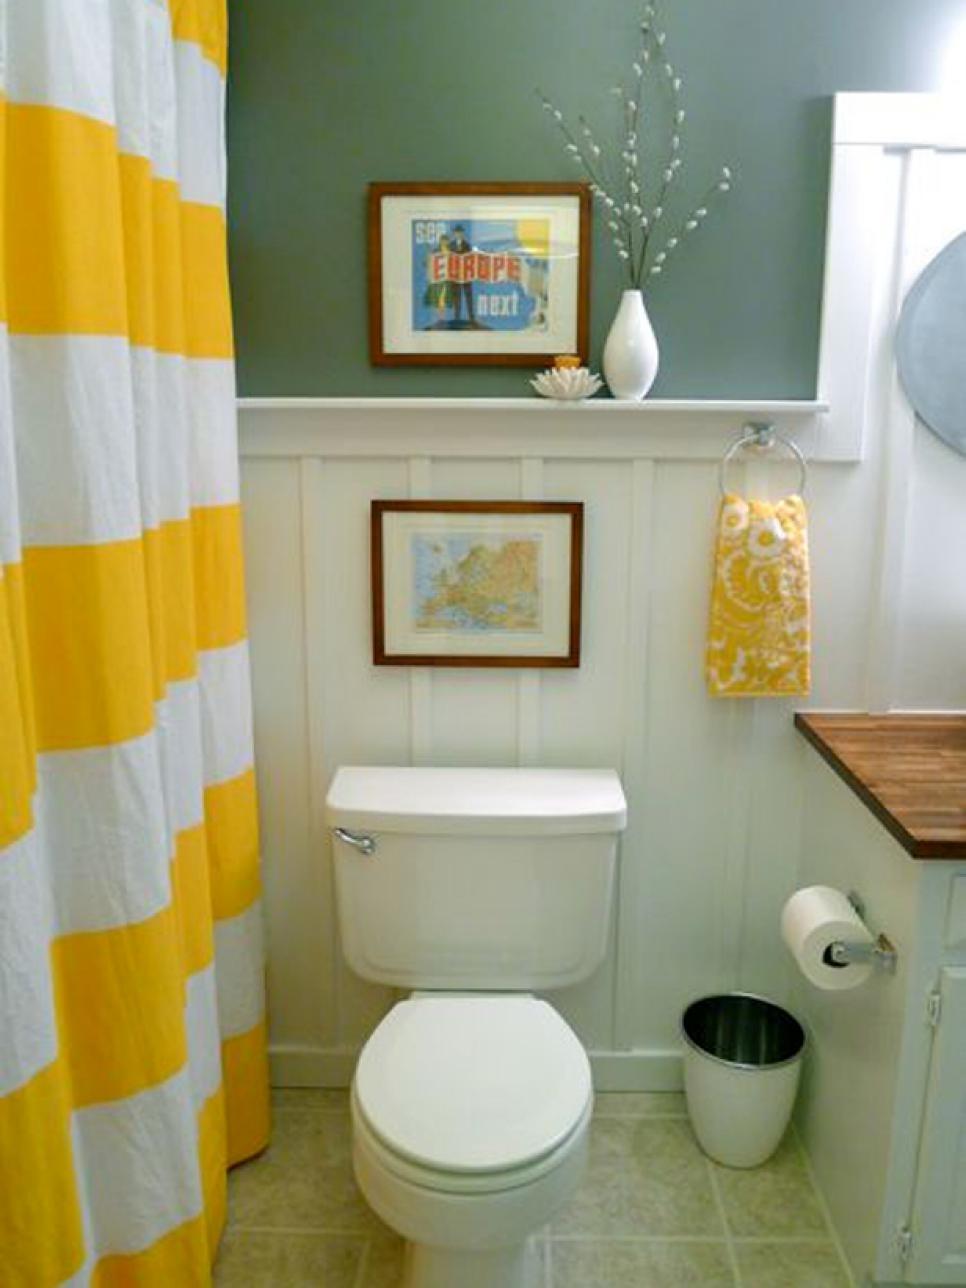 10 Cute Small Bathroom Ideas On A Budget %name